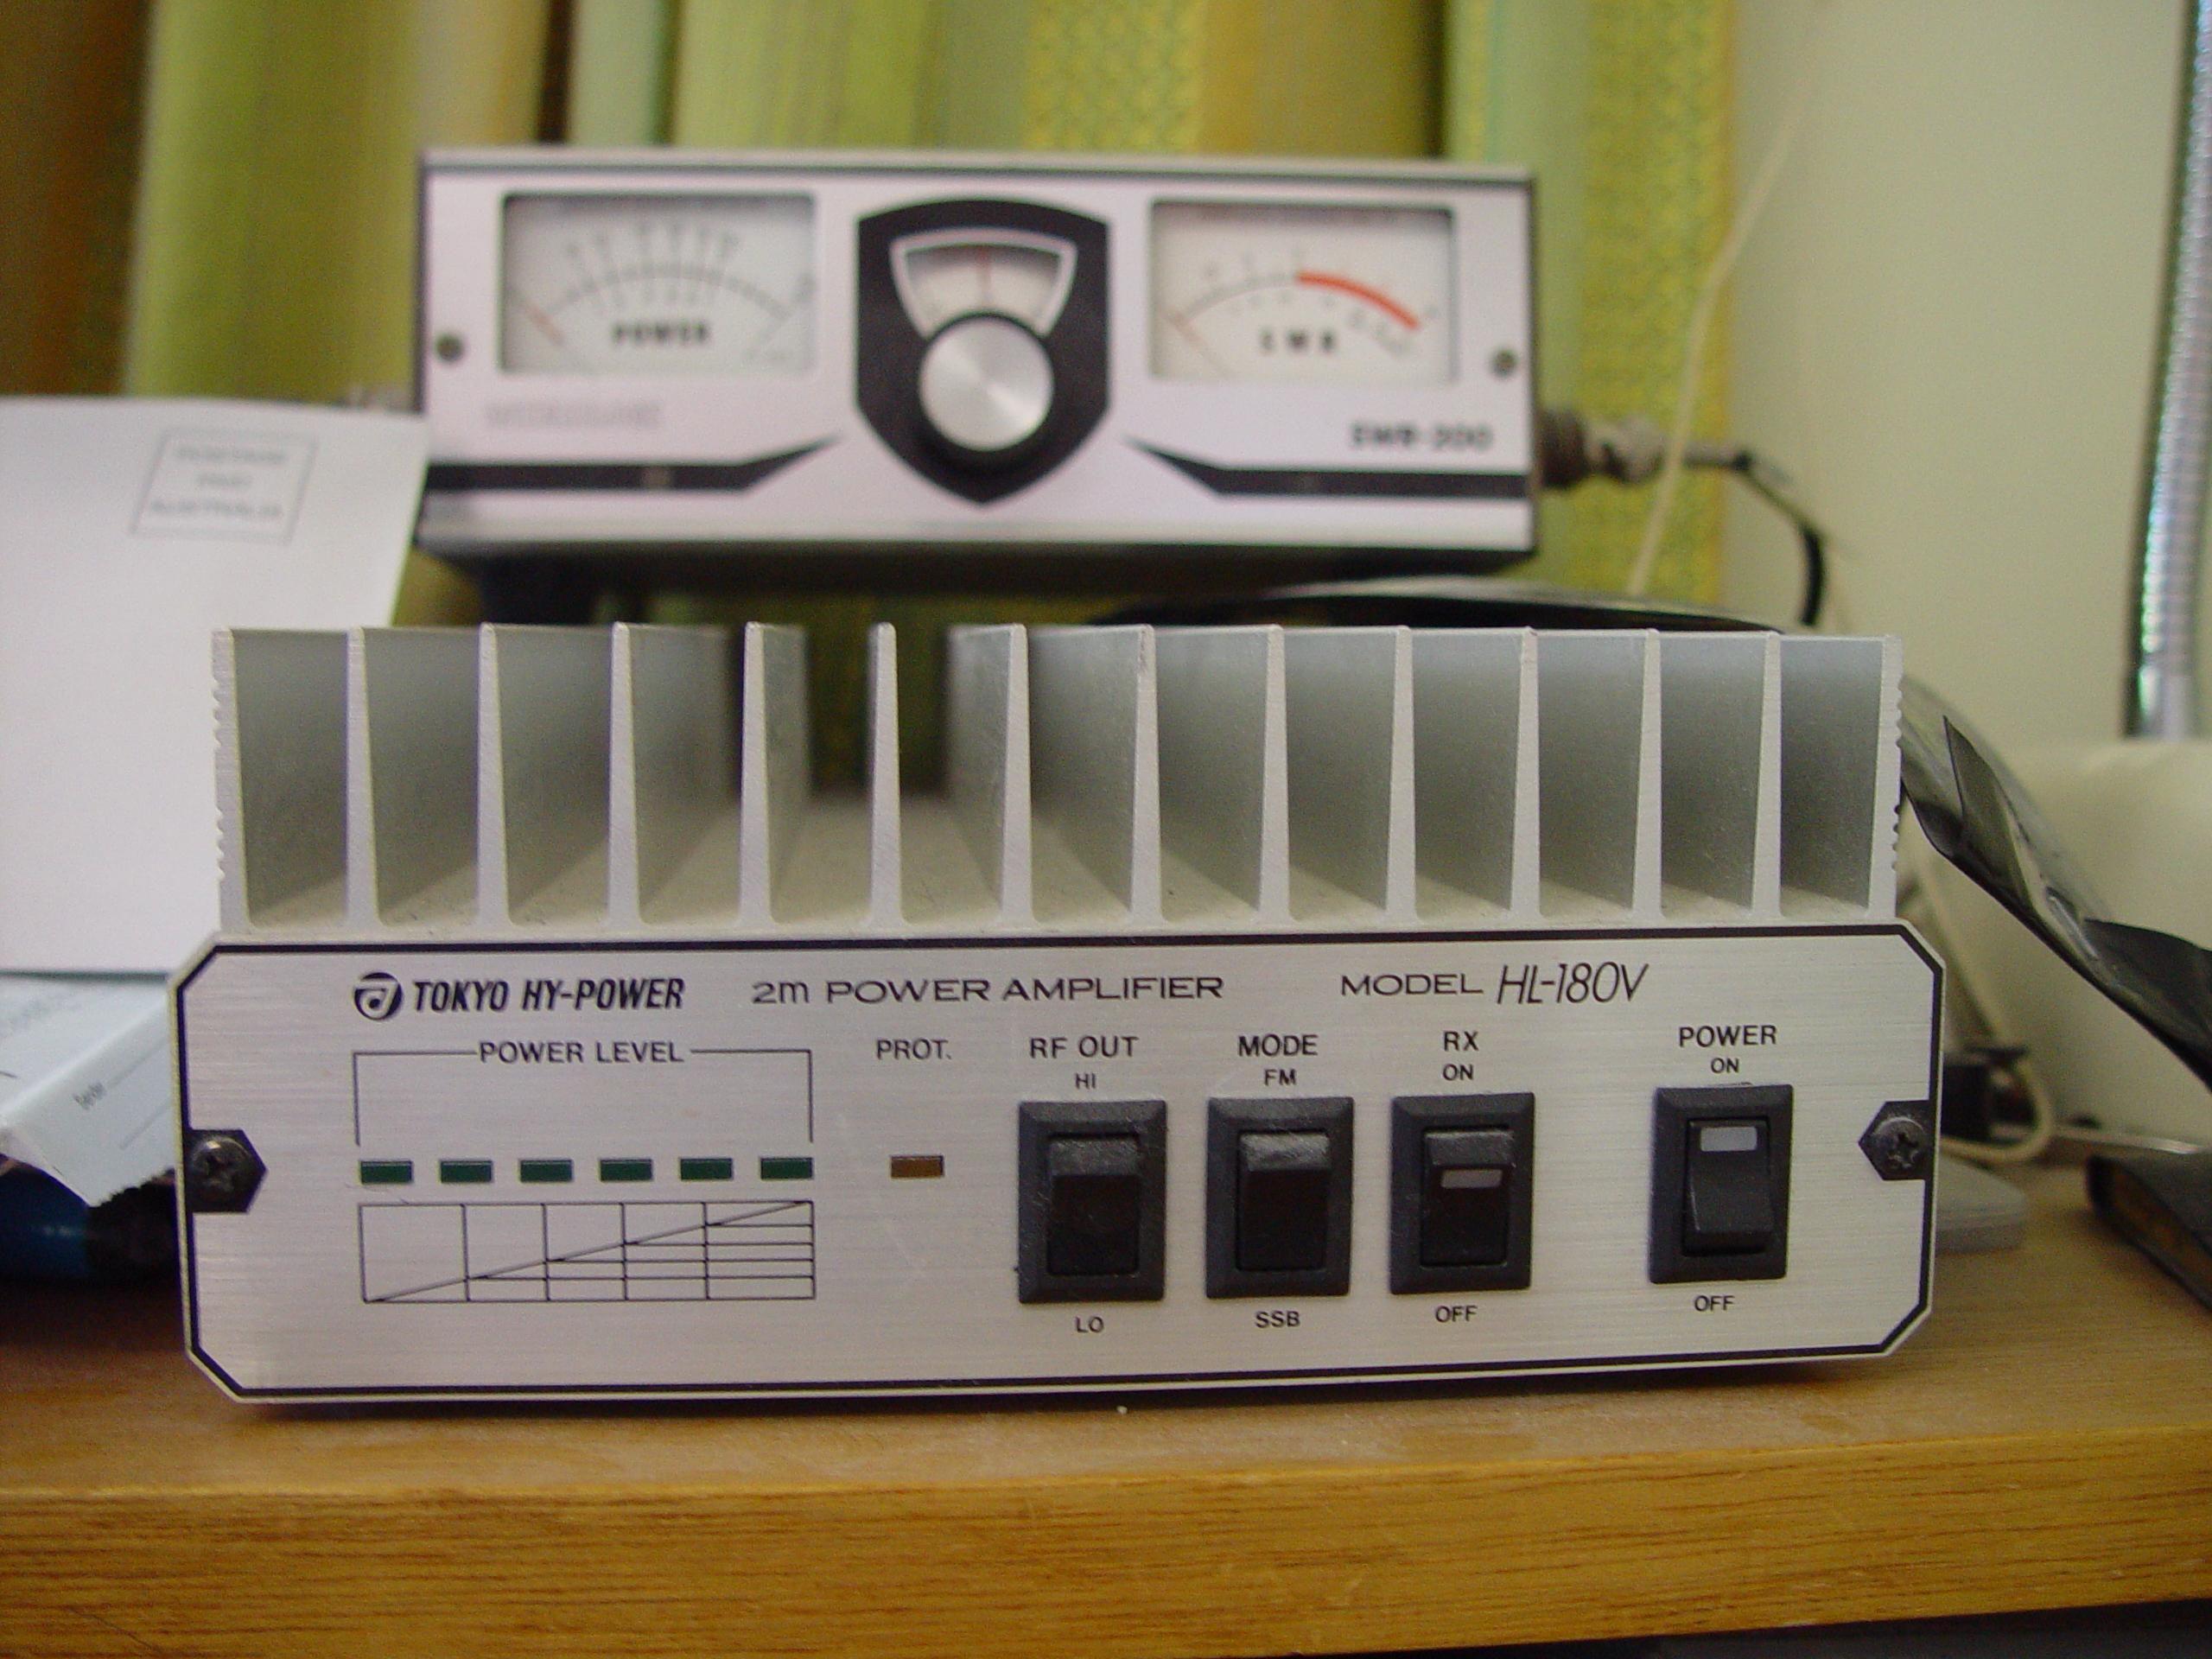 ... hy power hl 180v 2m band rf power amplifier.jpg - Wikimedia Commons